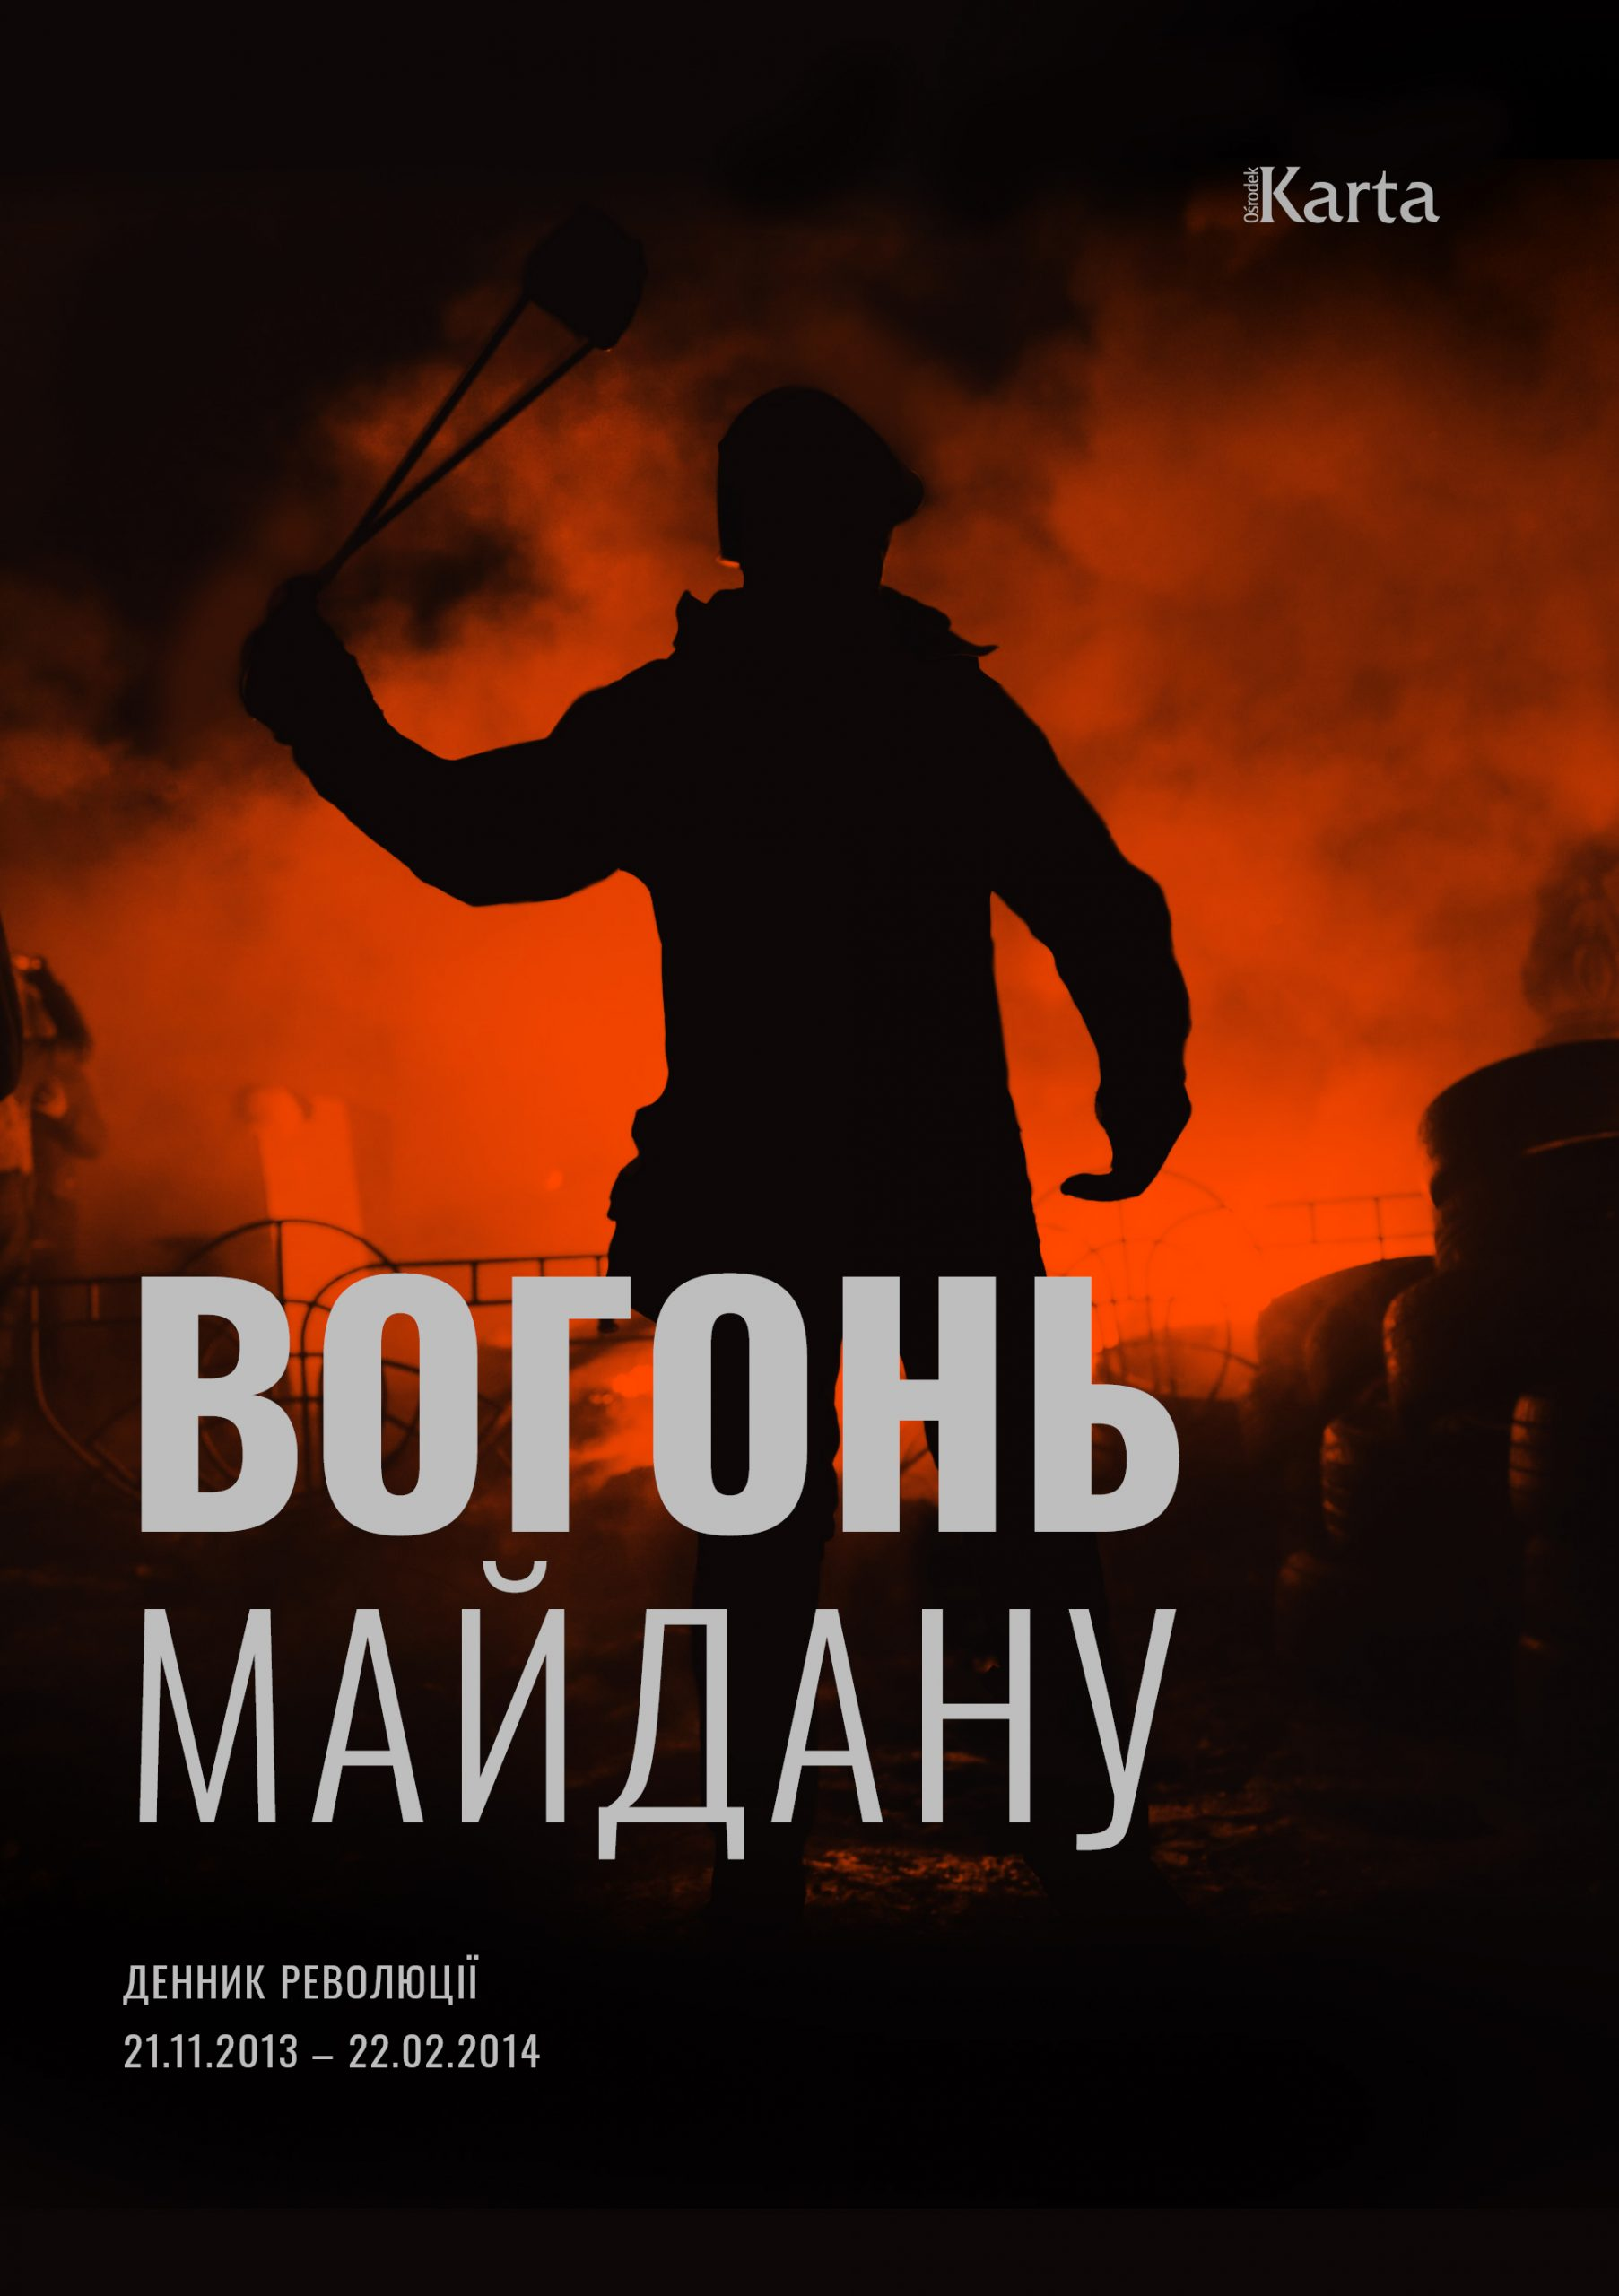 Вогонь Майдану